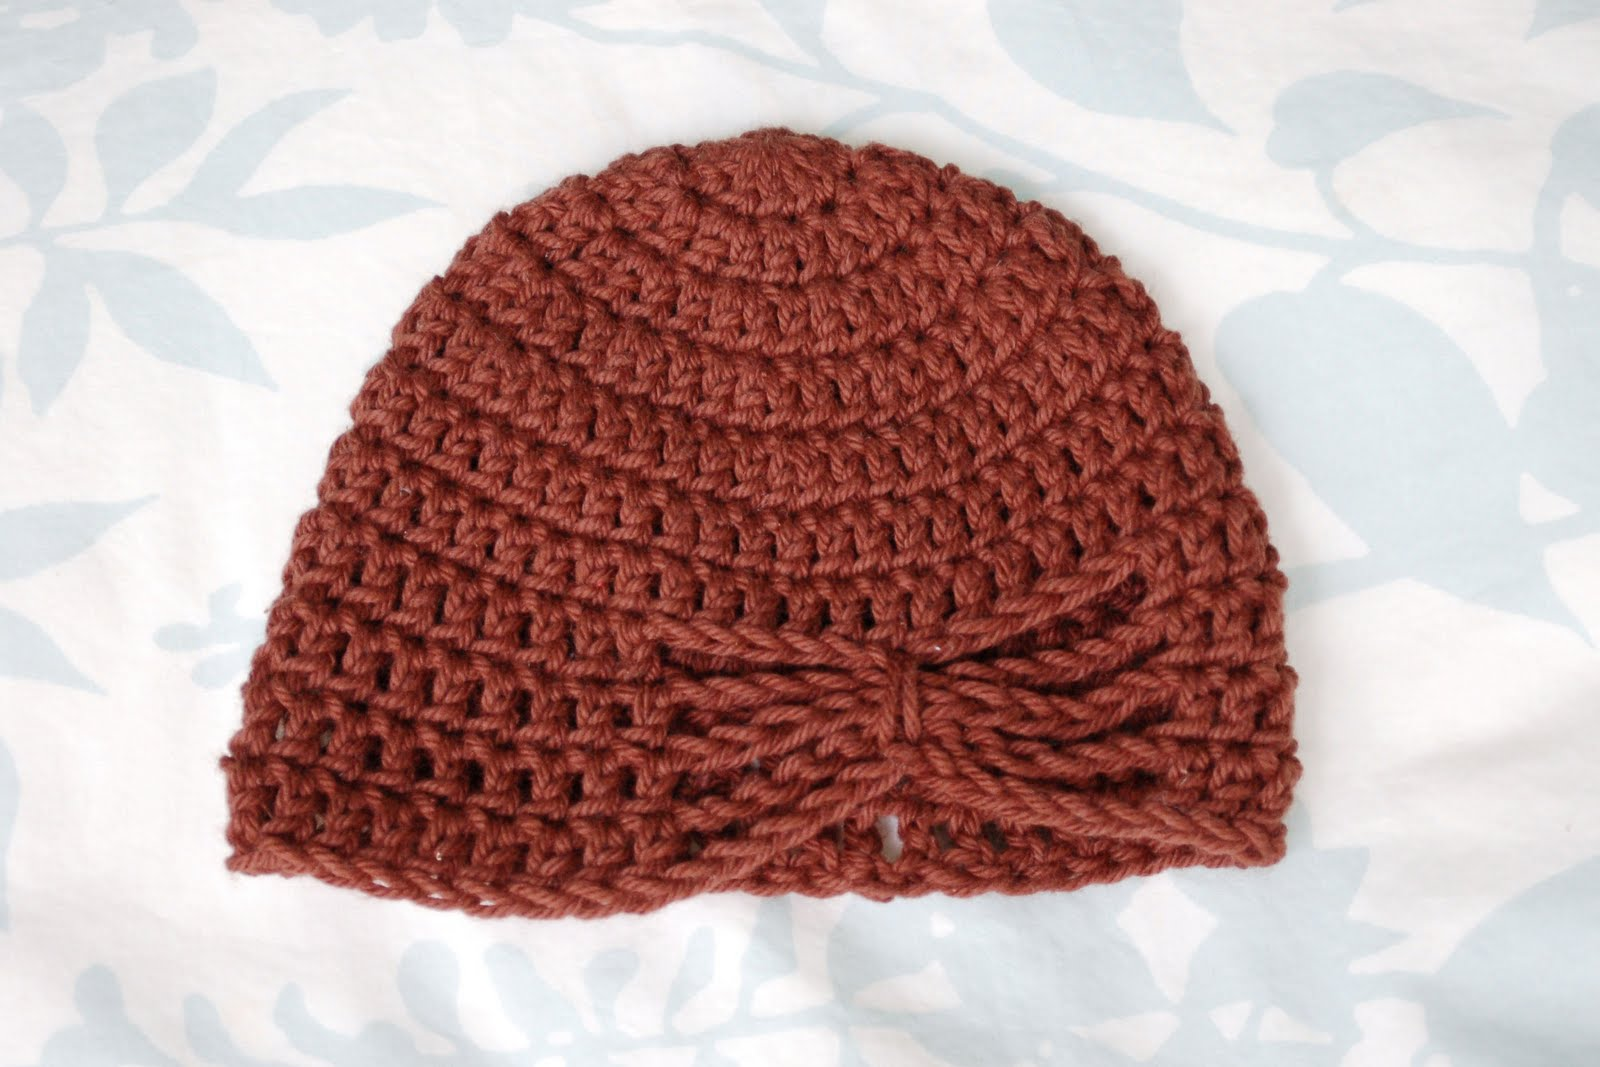 Alli Crafts: Free Pattern: Butterfly Hat - 3 months